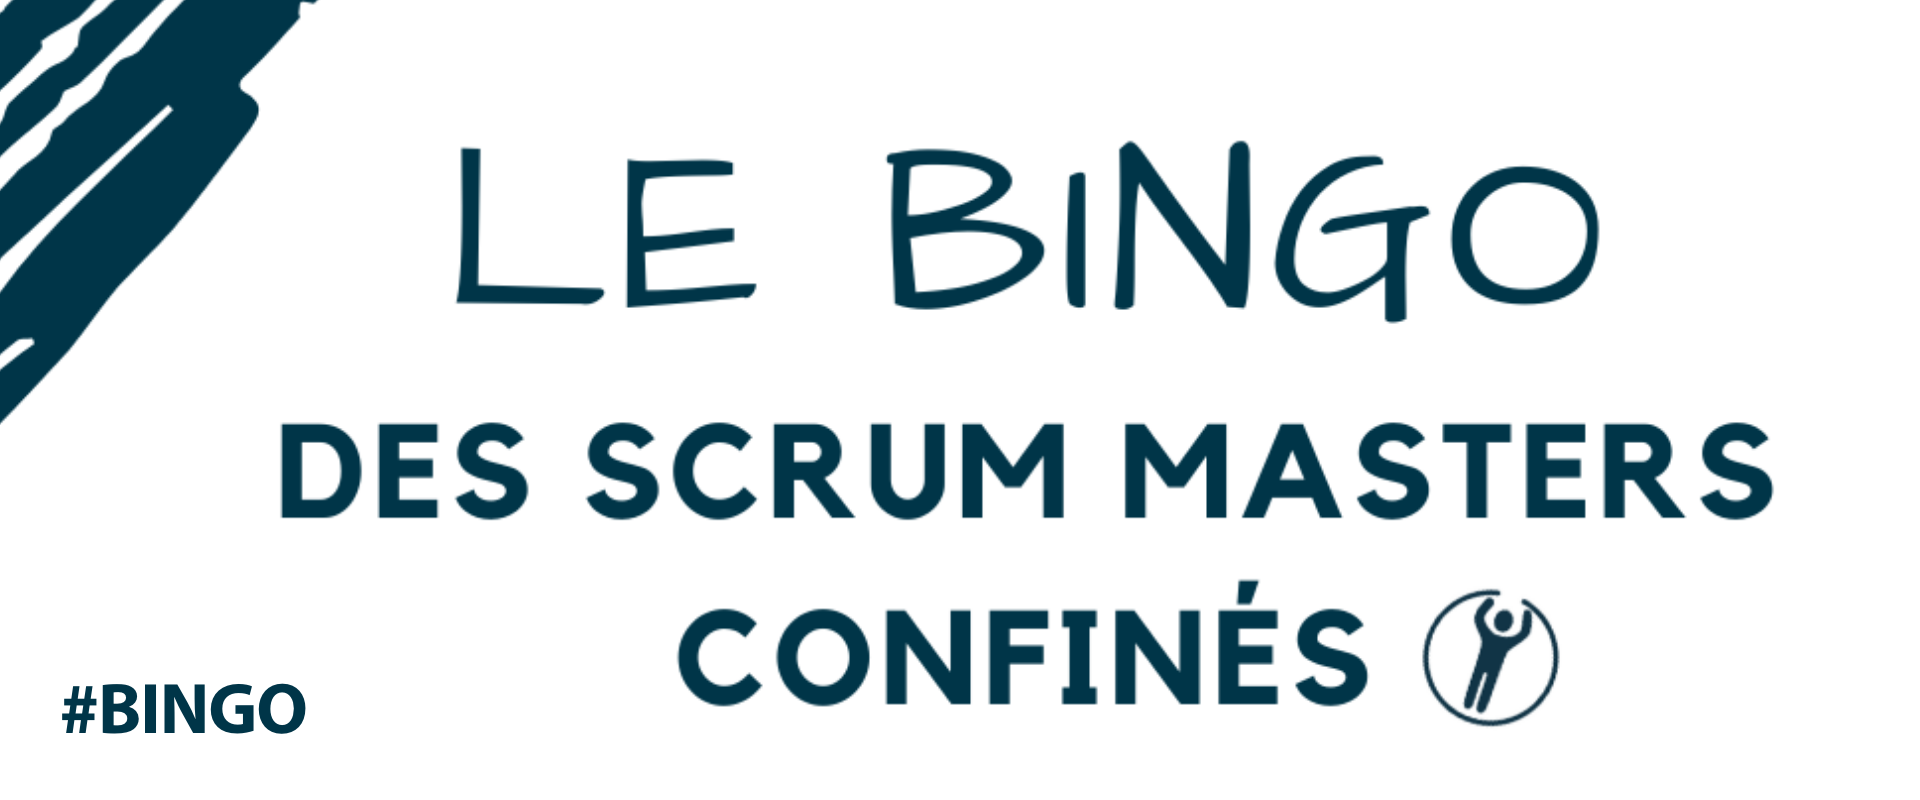 bingo scrum master confine